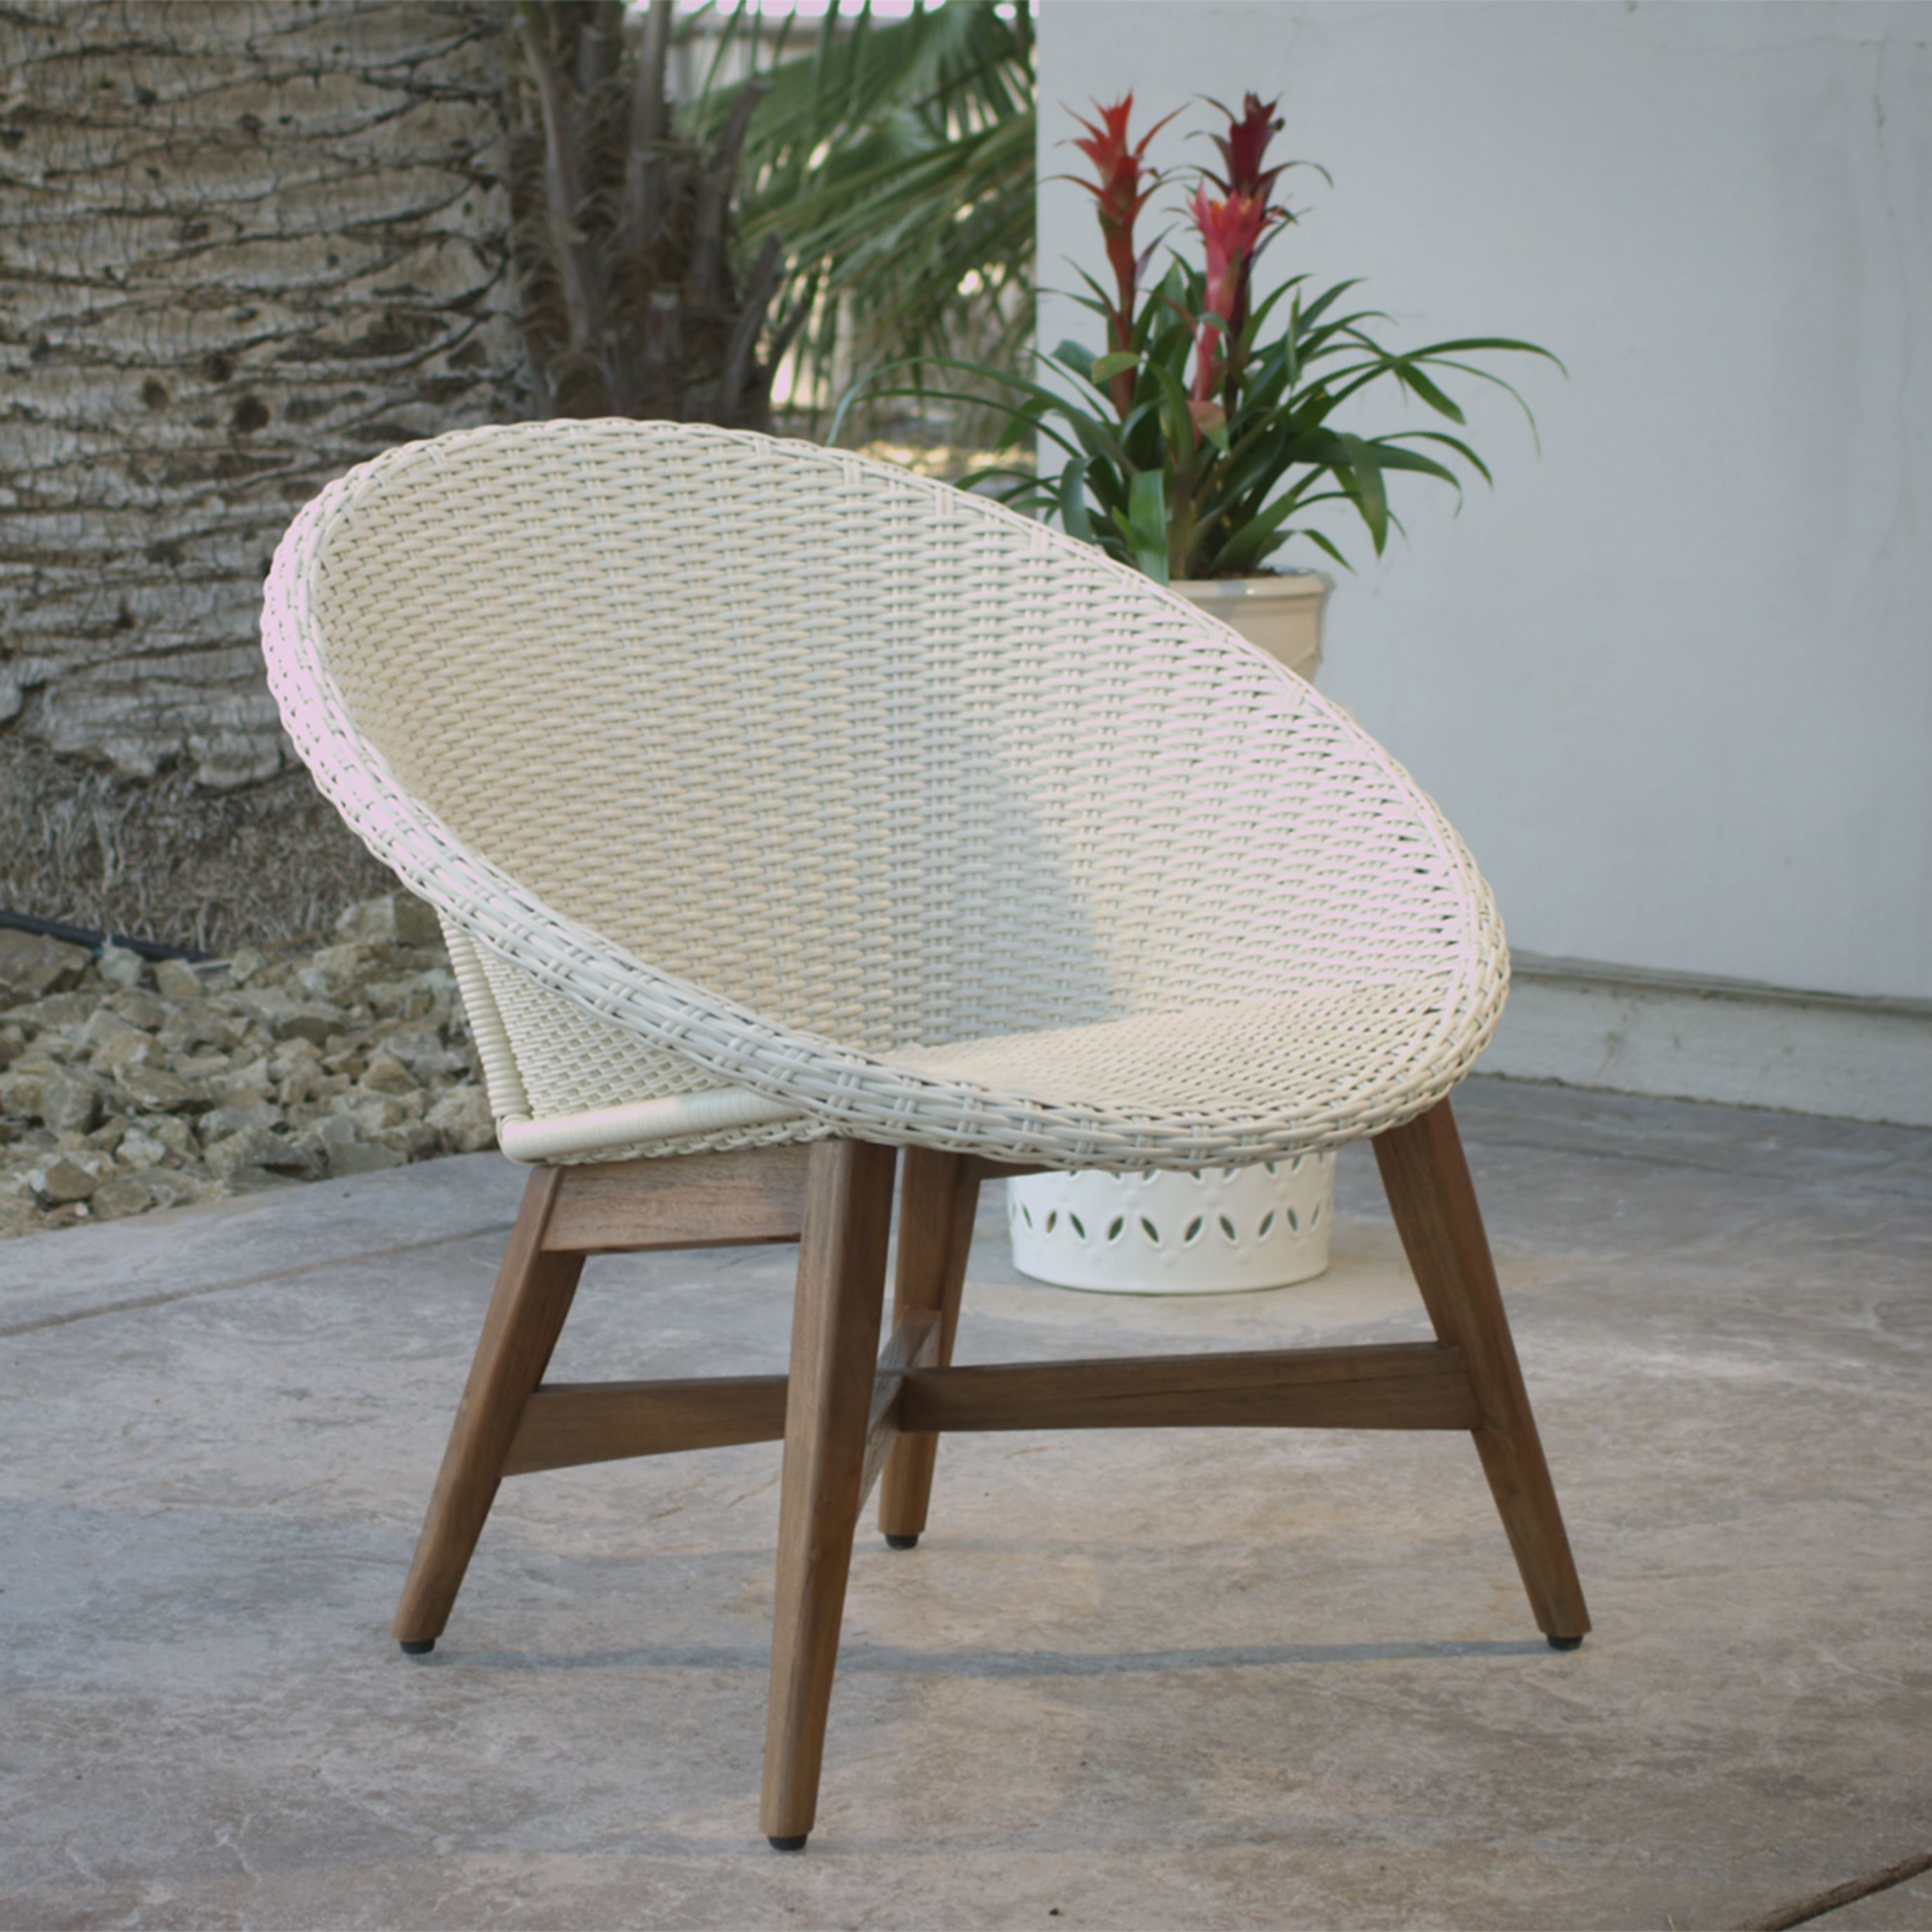 Download Wallpaper World Market Wicker Patio Furniture